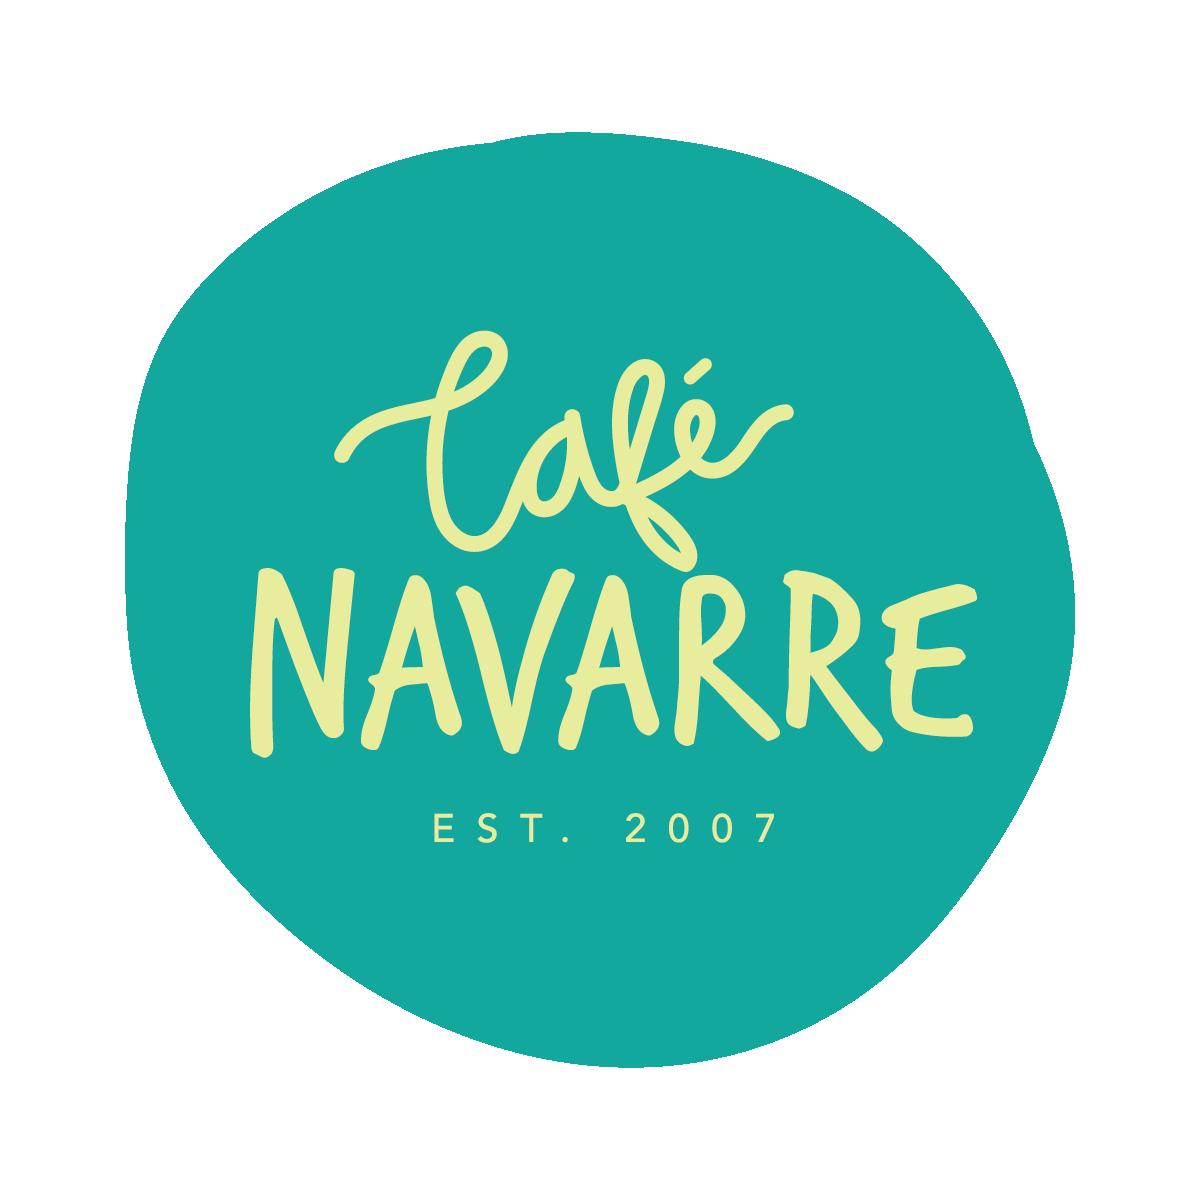 Café Navarre